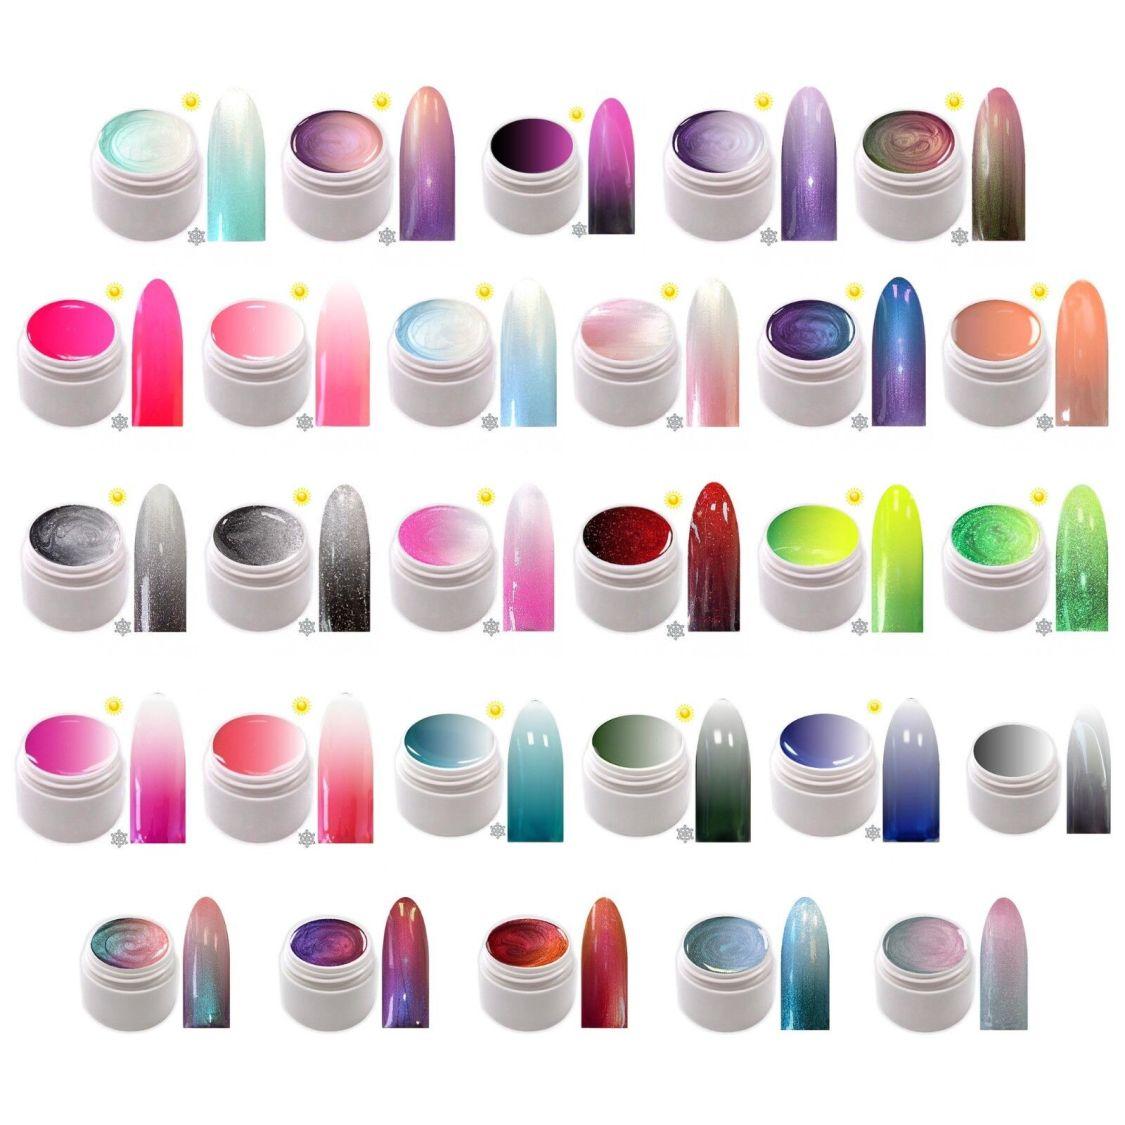 Thermo UV Gel Farbgel Metallic Glitter Flip Flop Colour Changing Farbwechsel